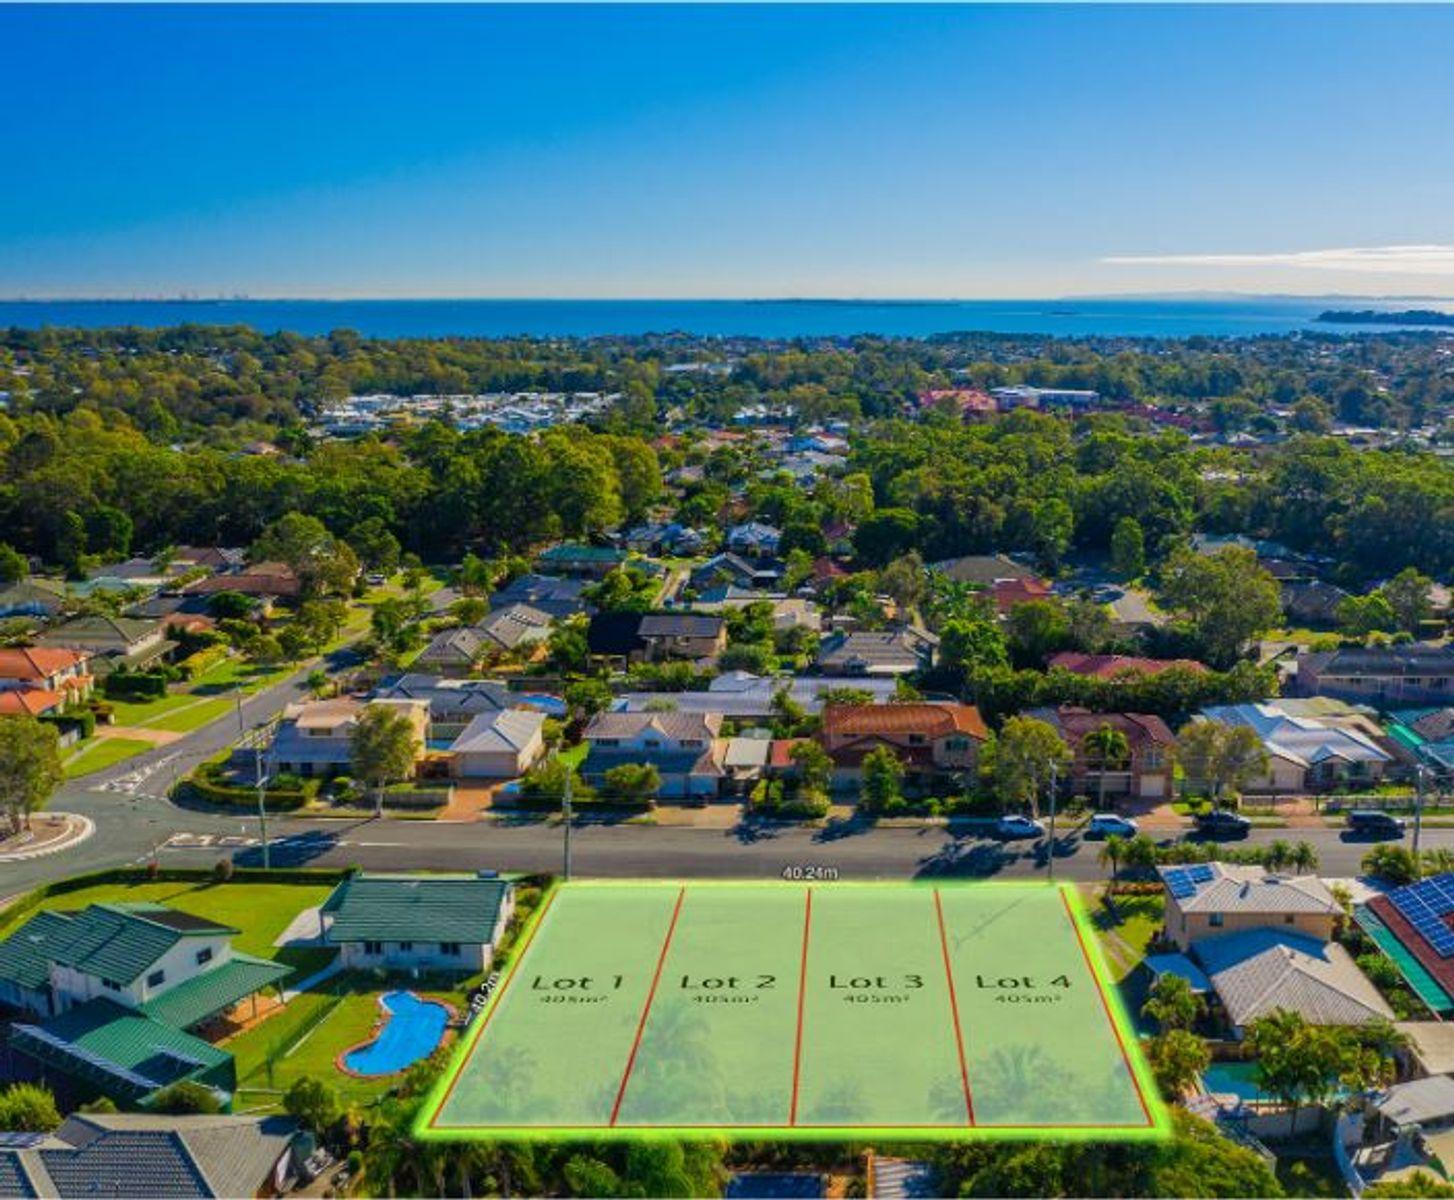 Lot 3 55-57 Burbank Road, Birkdale, QLD 4159